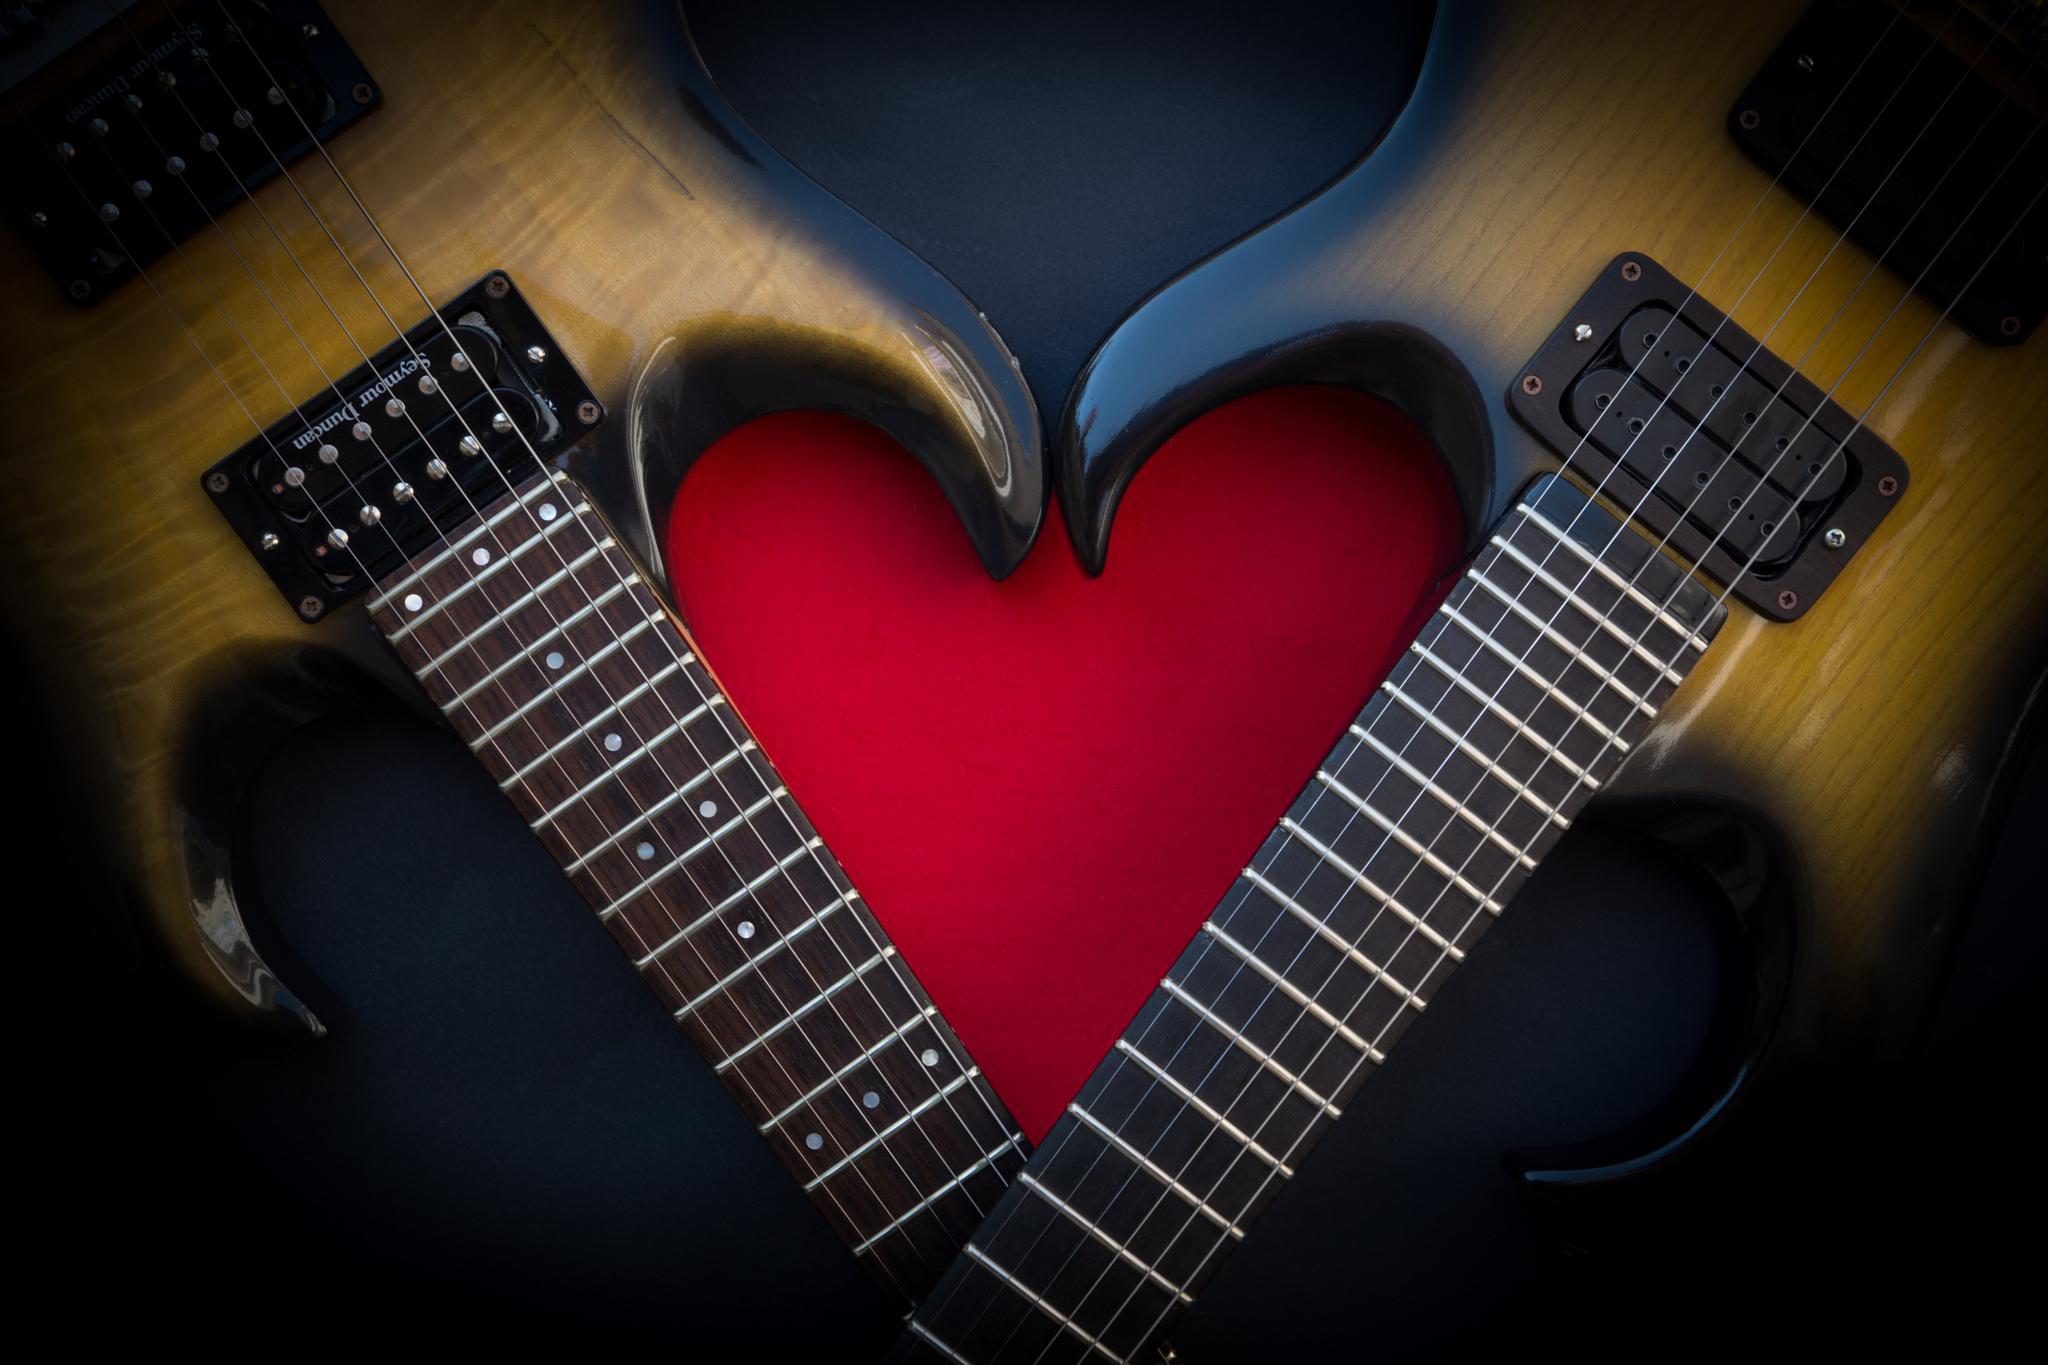 Guitars In Love #1 by mauro.lombardozzi